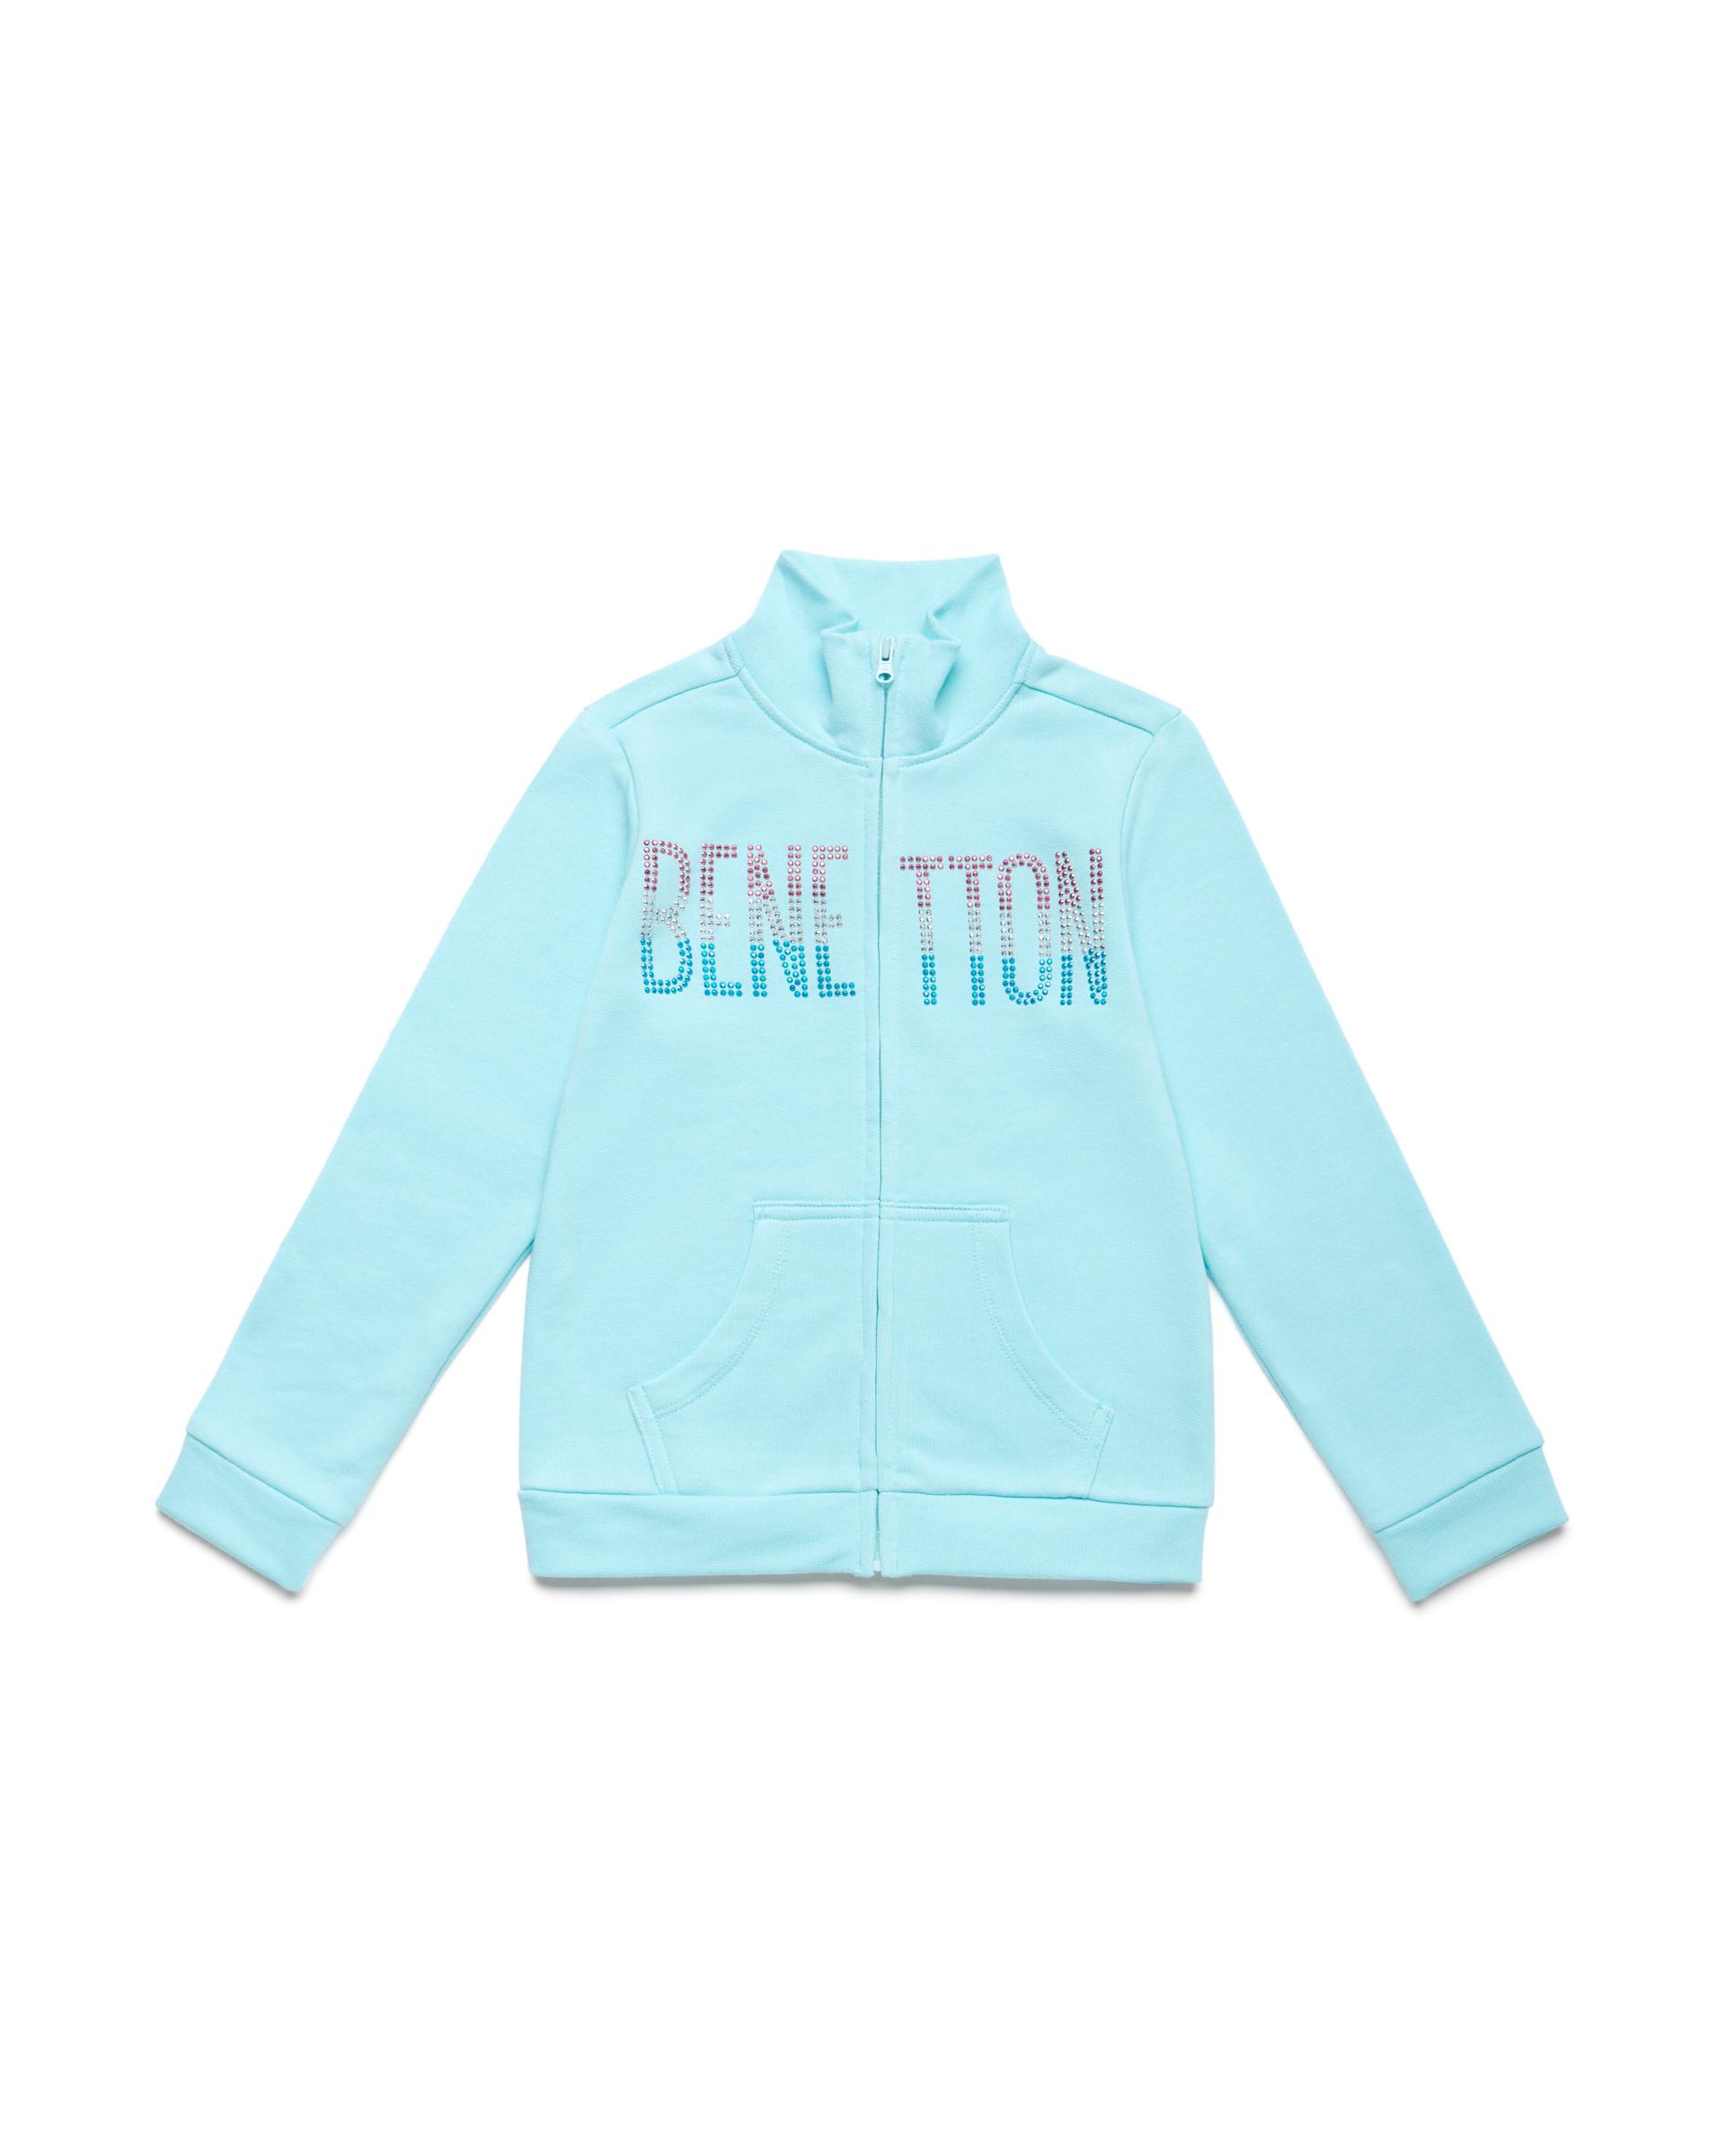 Купить 20P_3J68C5793_0Z8, Толстовка для девочек Benetton 3J68C5793_0Z8 р-р 170, United Colors of Benetton, Толстовки для девочек